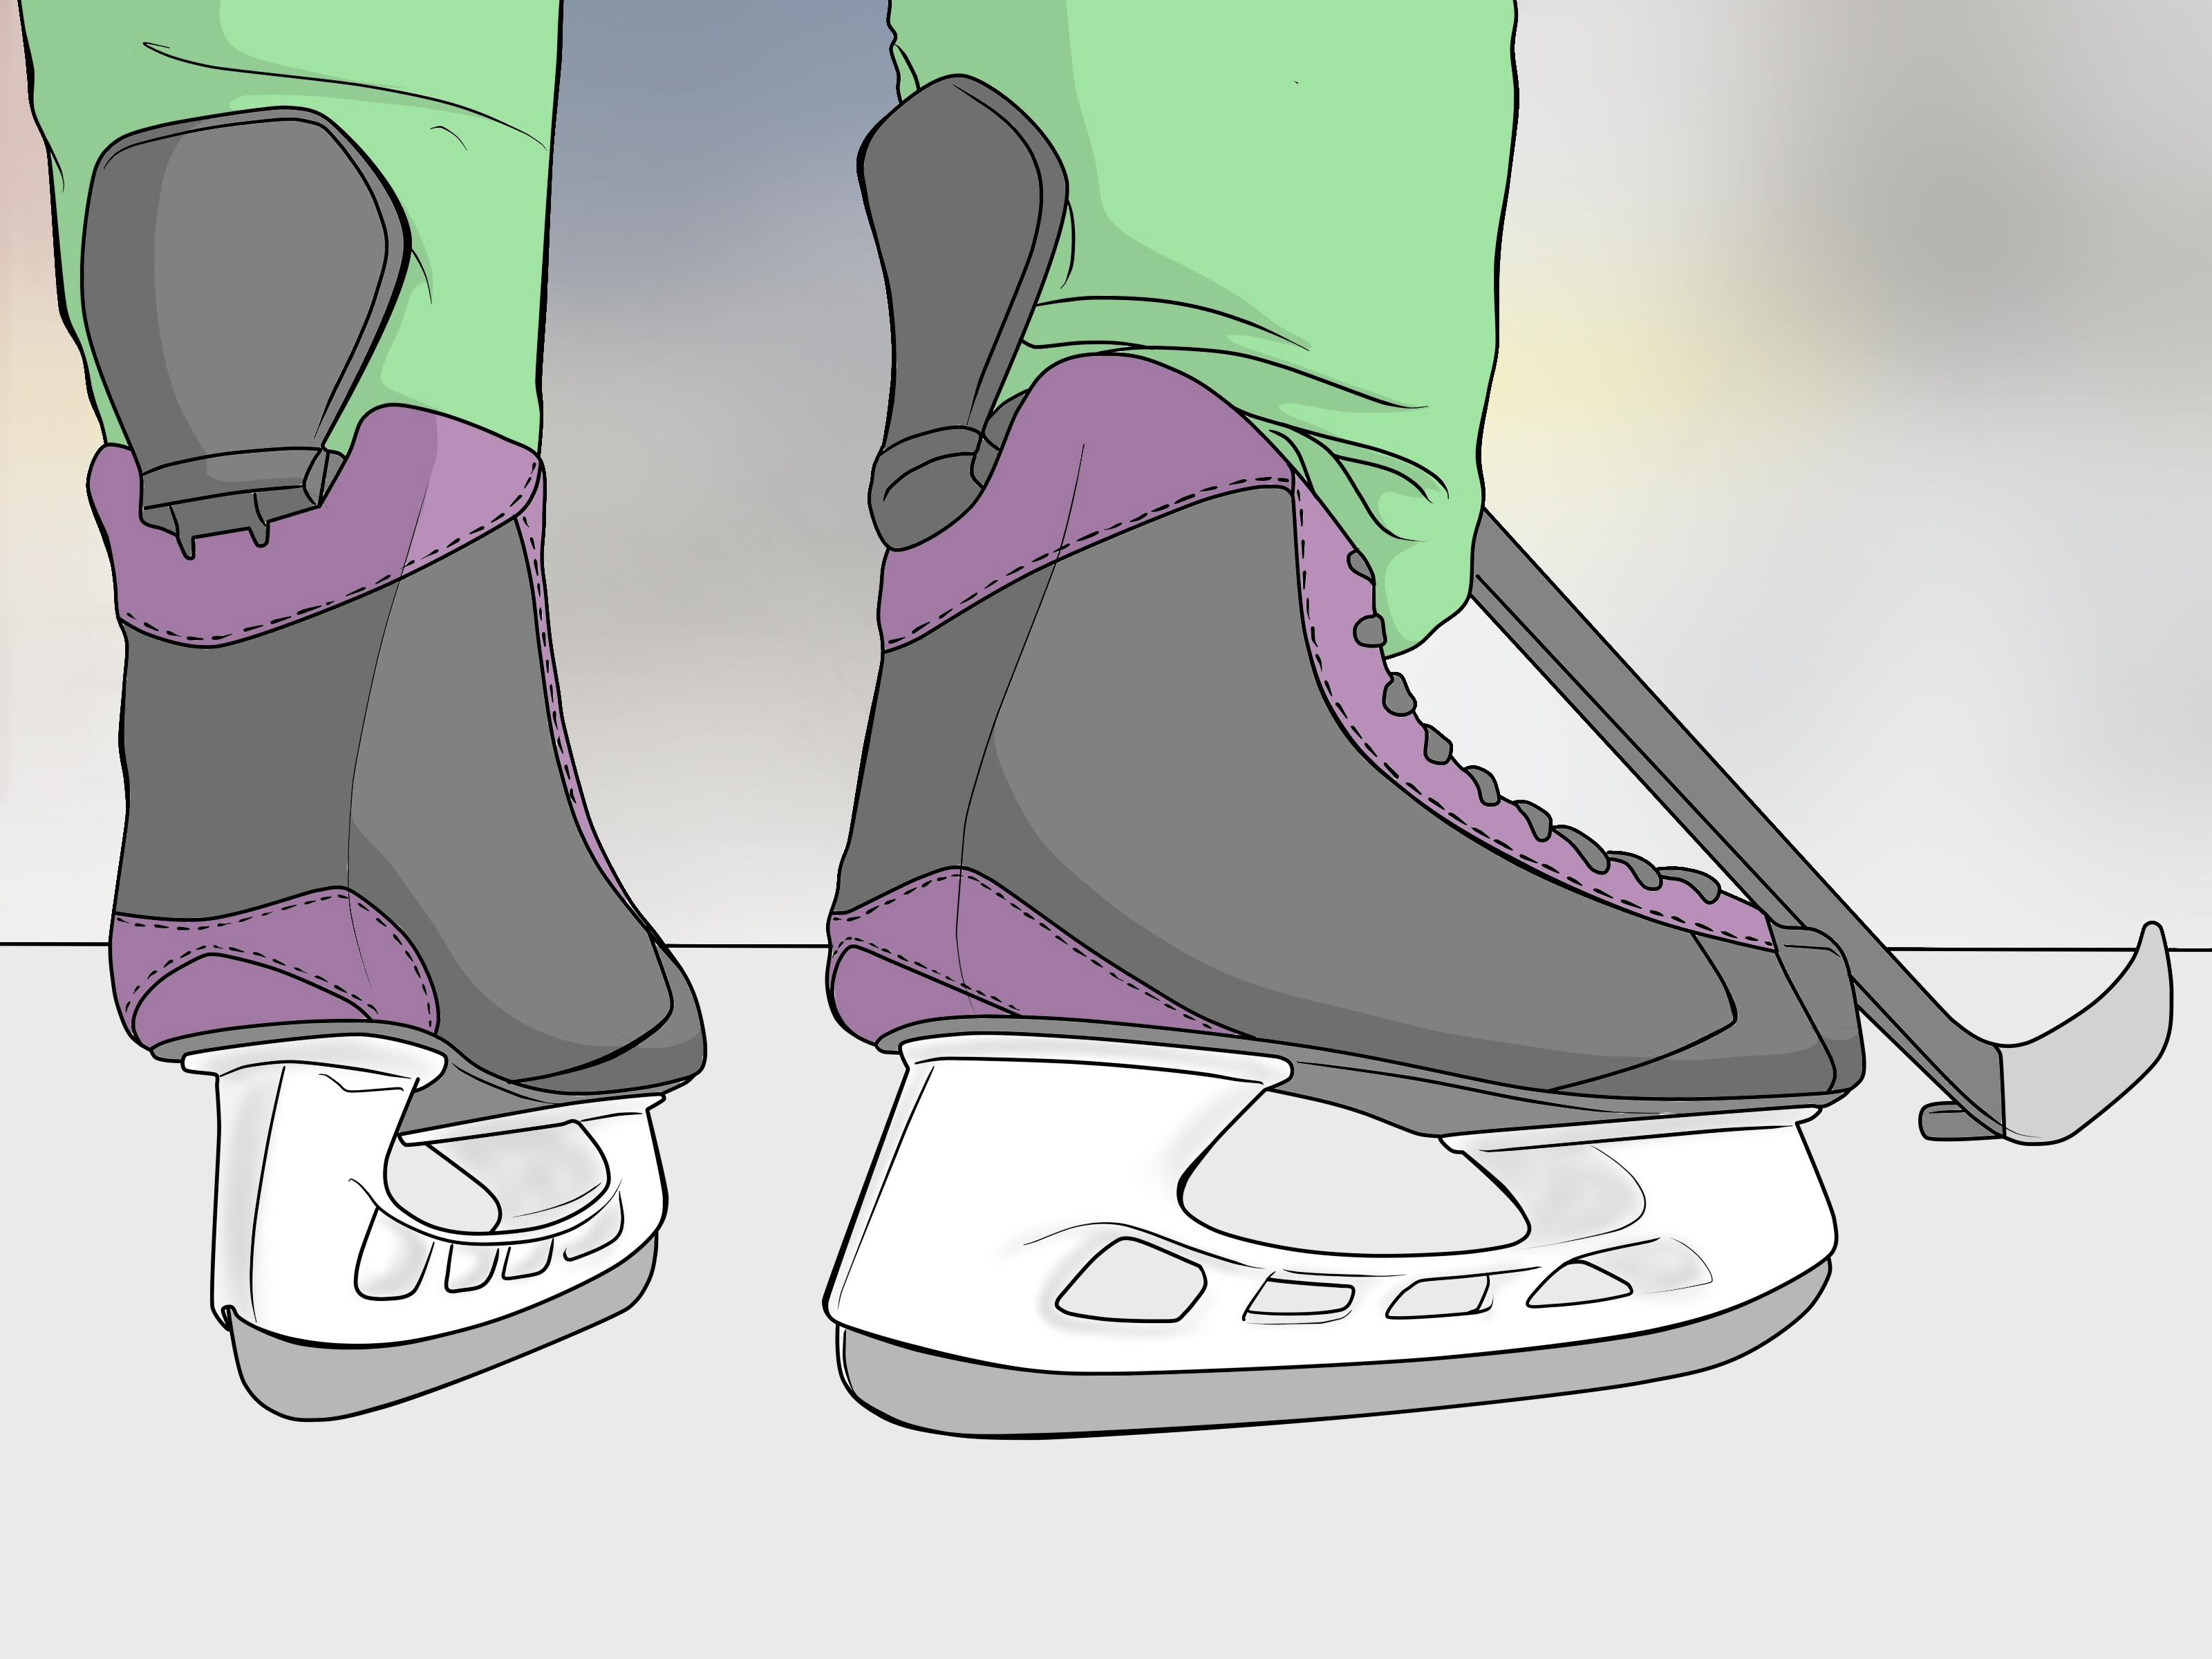 3200x2400 4 Ways To Buy Ice Skates